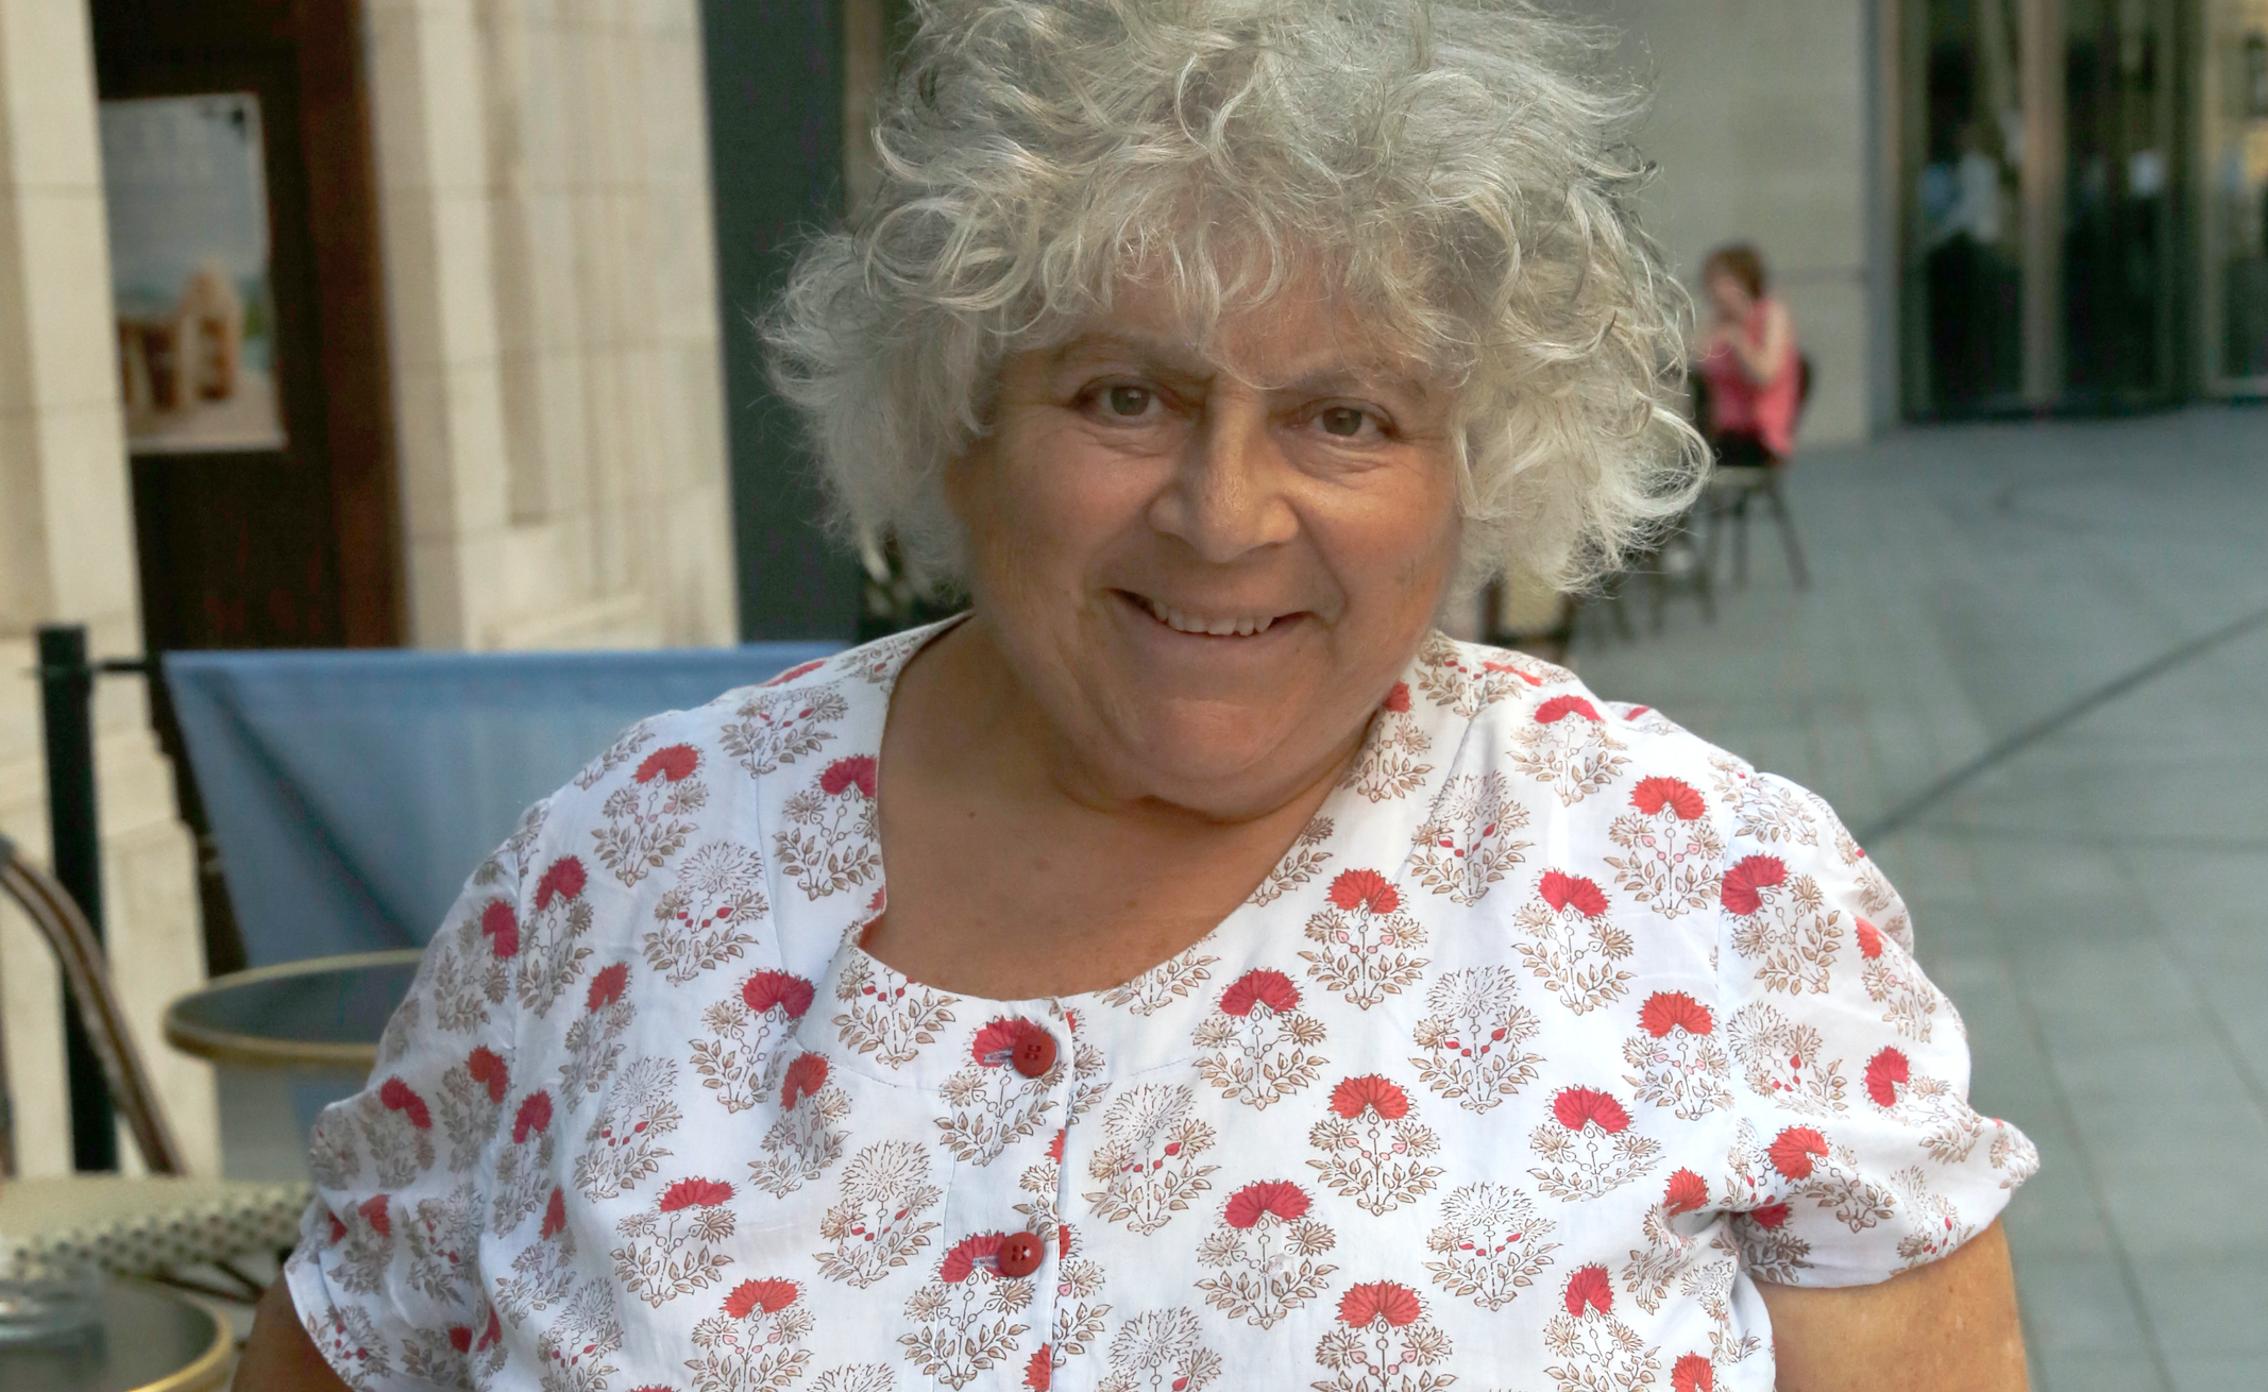 Miriam Margolyes clarifies controversial remarks about 'greedy' Australians